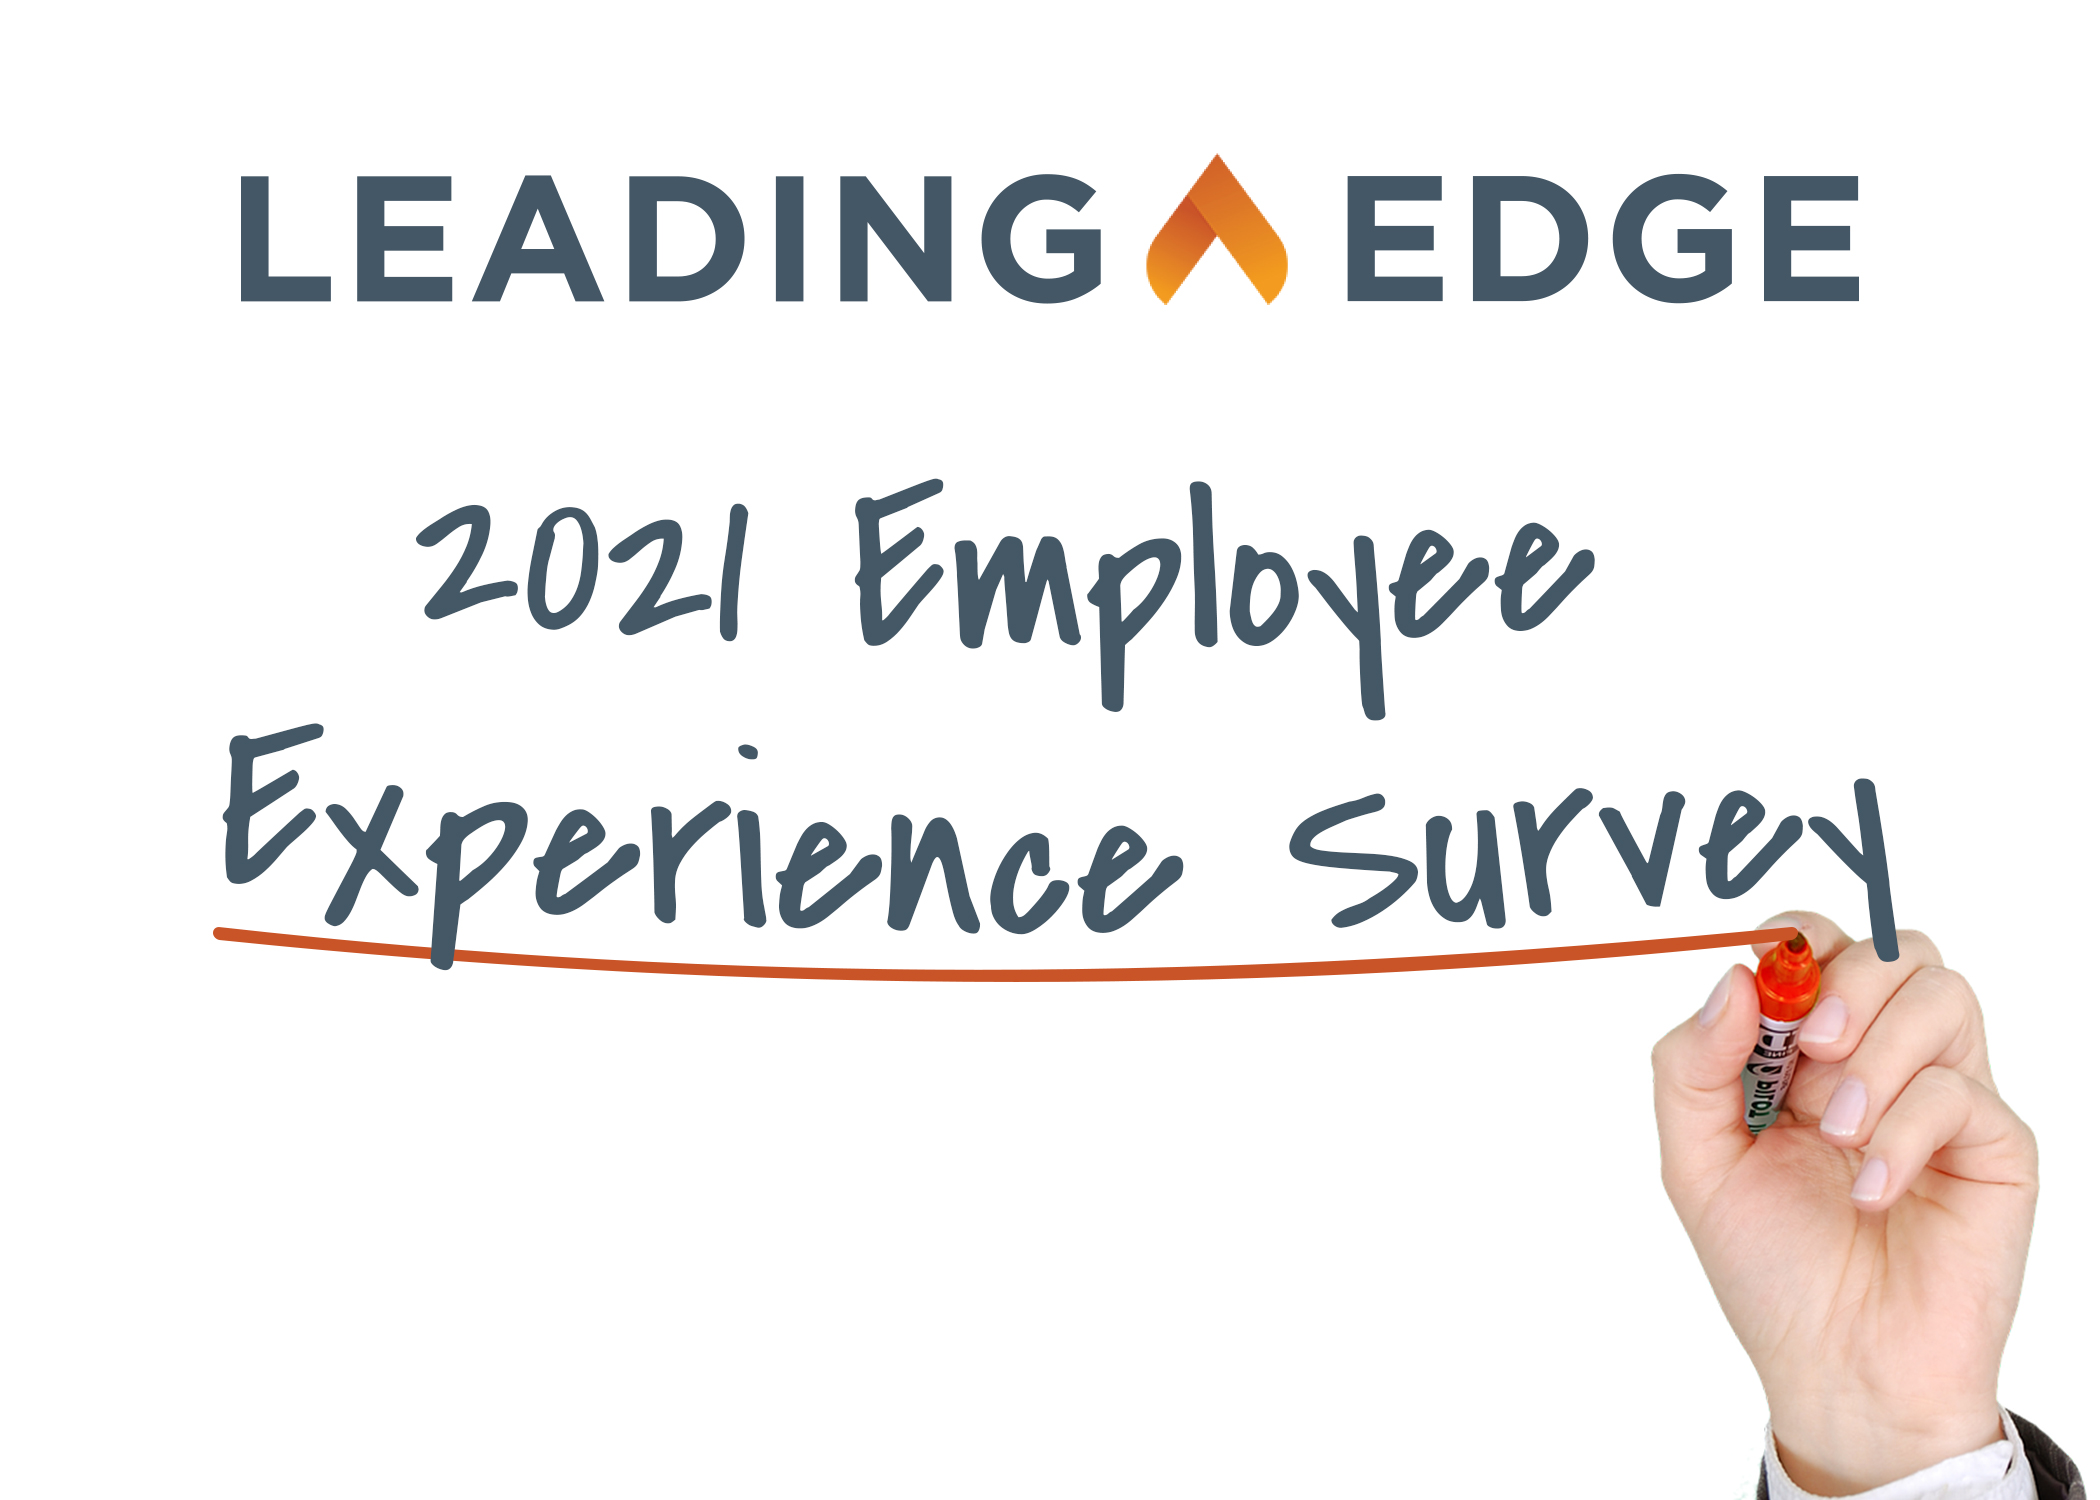 Employee Experience Survey 2021